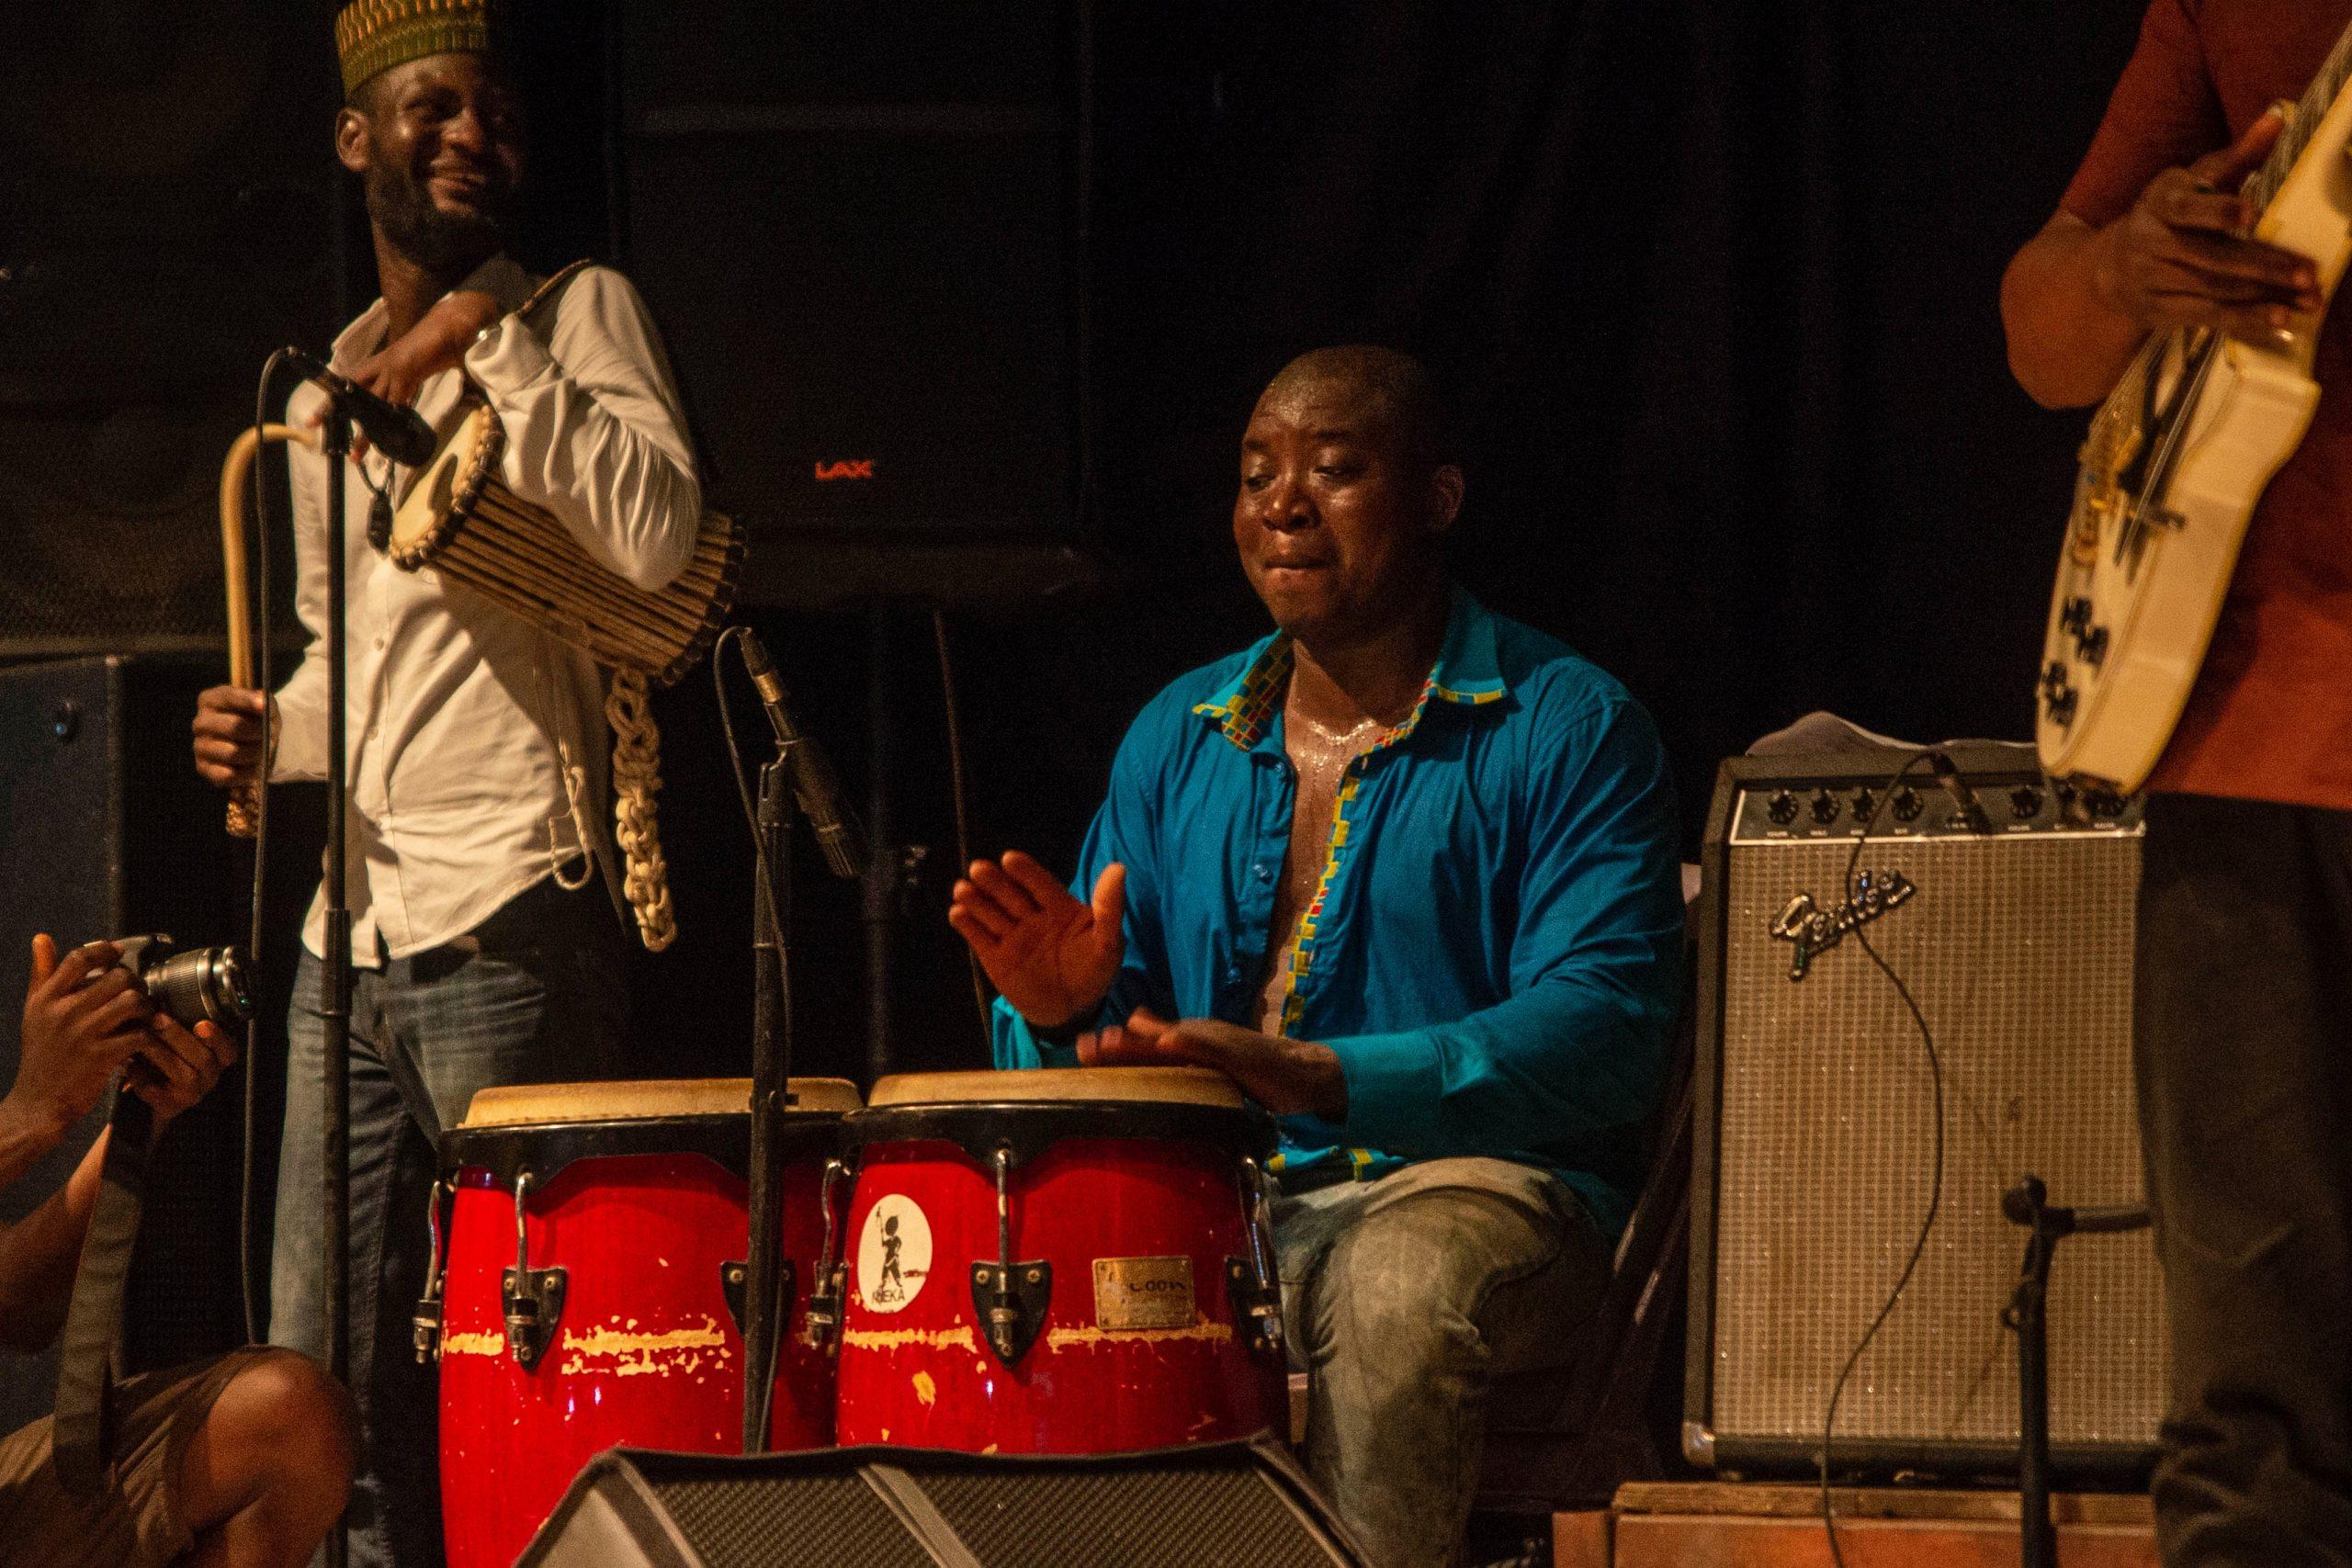 A drummer at a Lagos concert